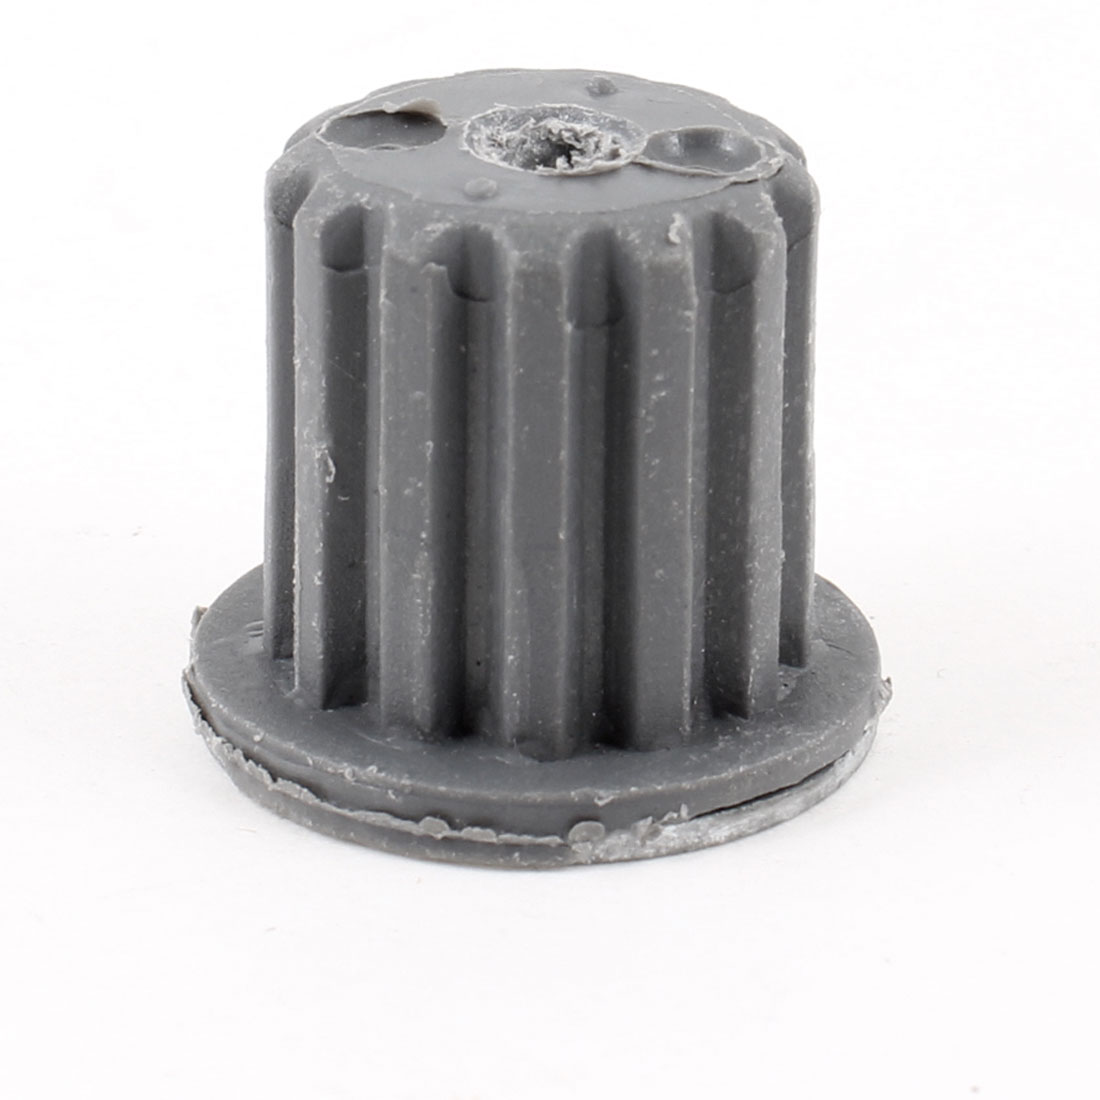 Repair Part Universal Metal Pulsator Core 13 Teeth for Washing Machine Washer